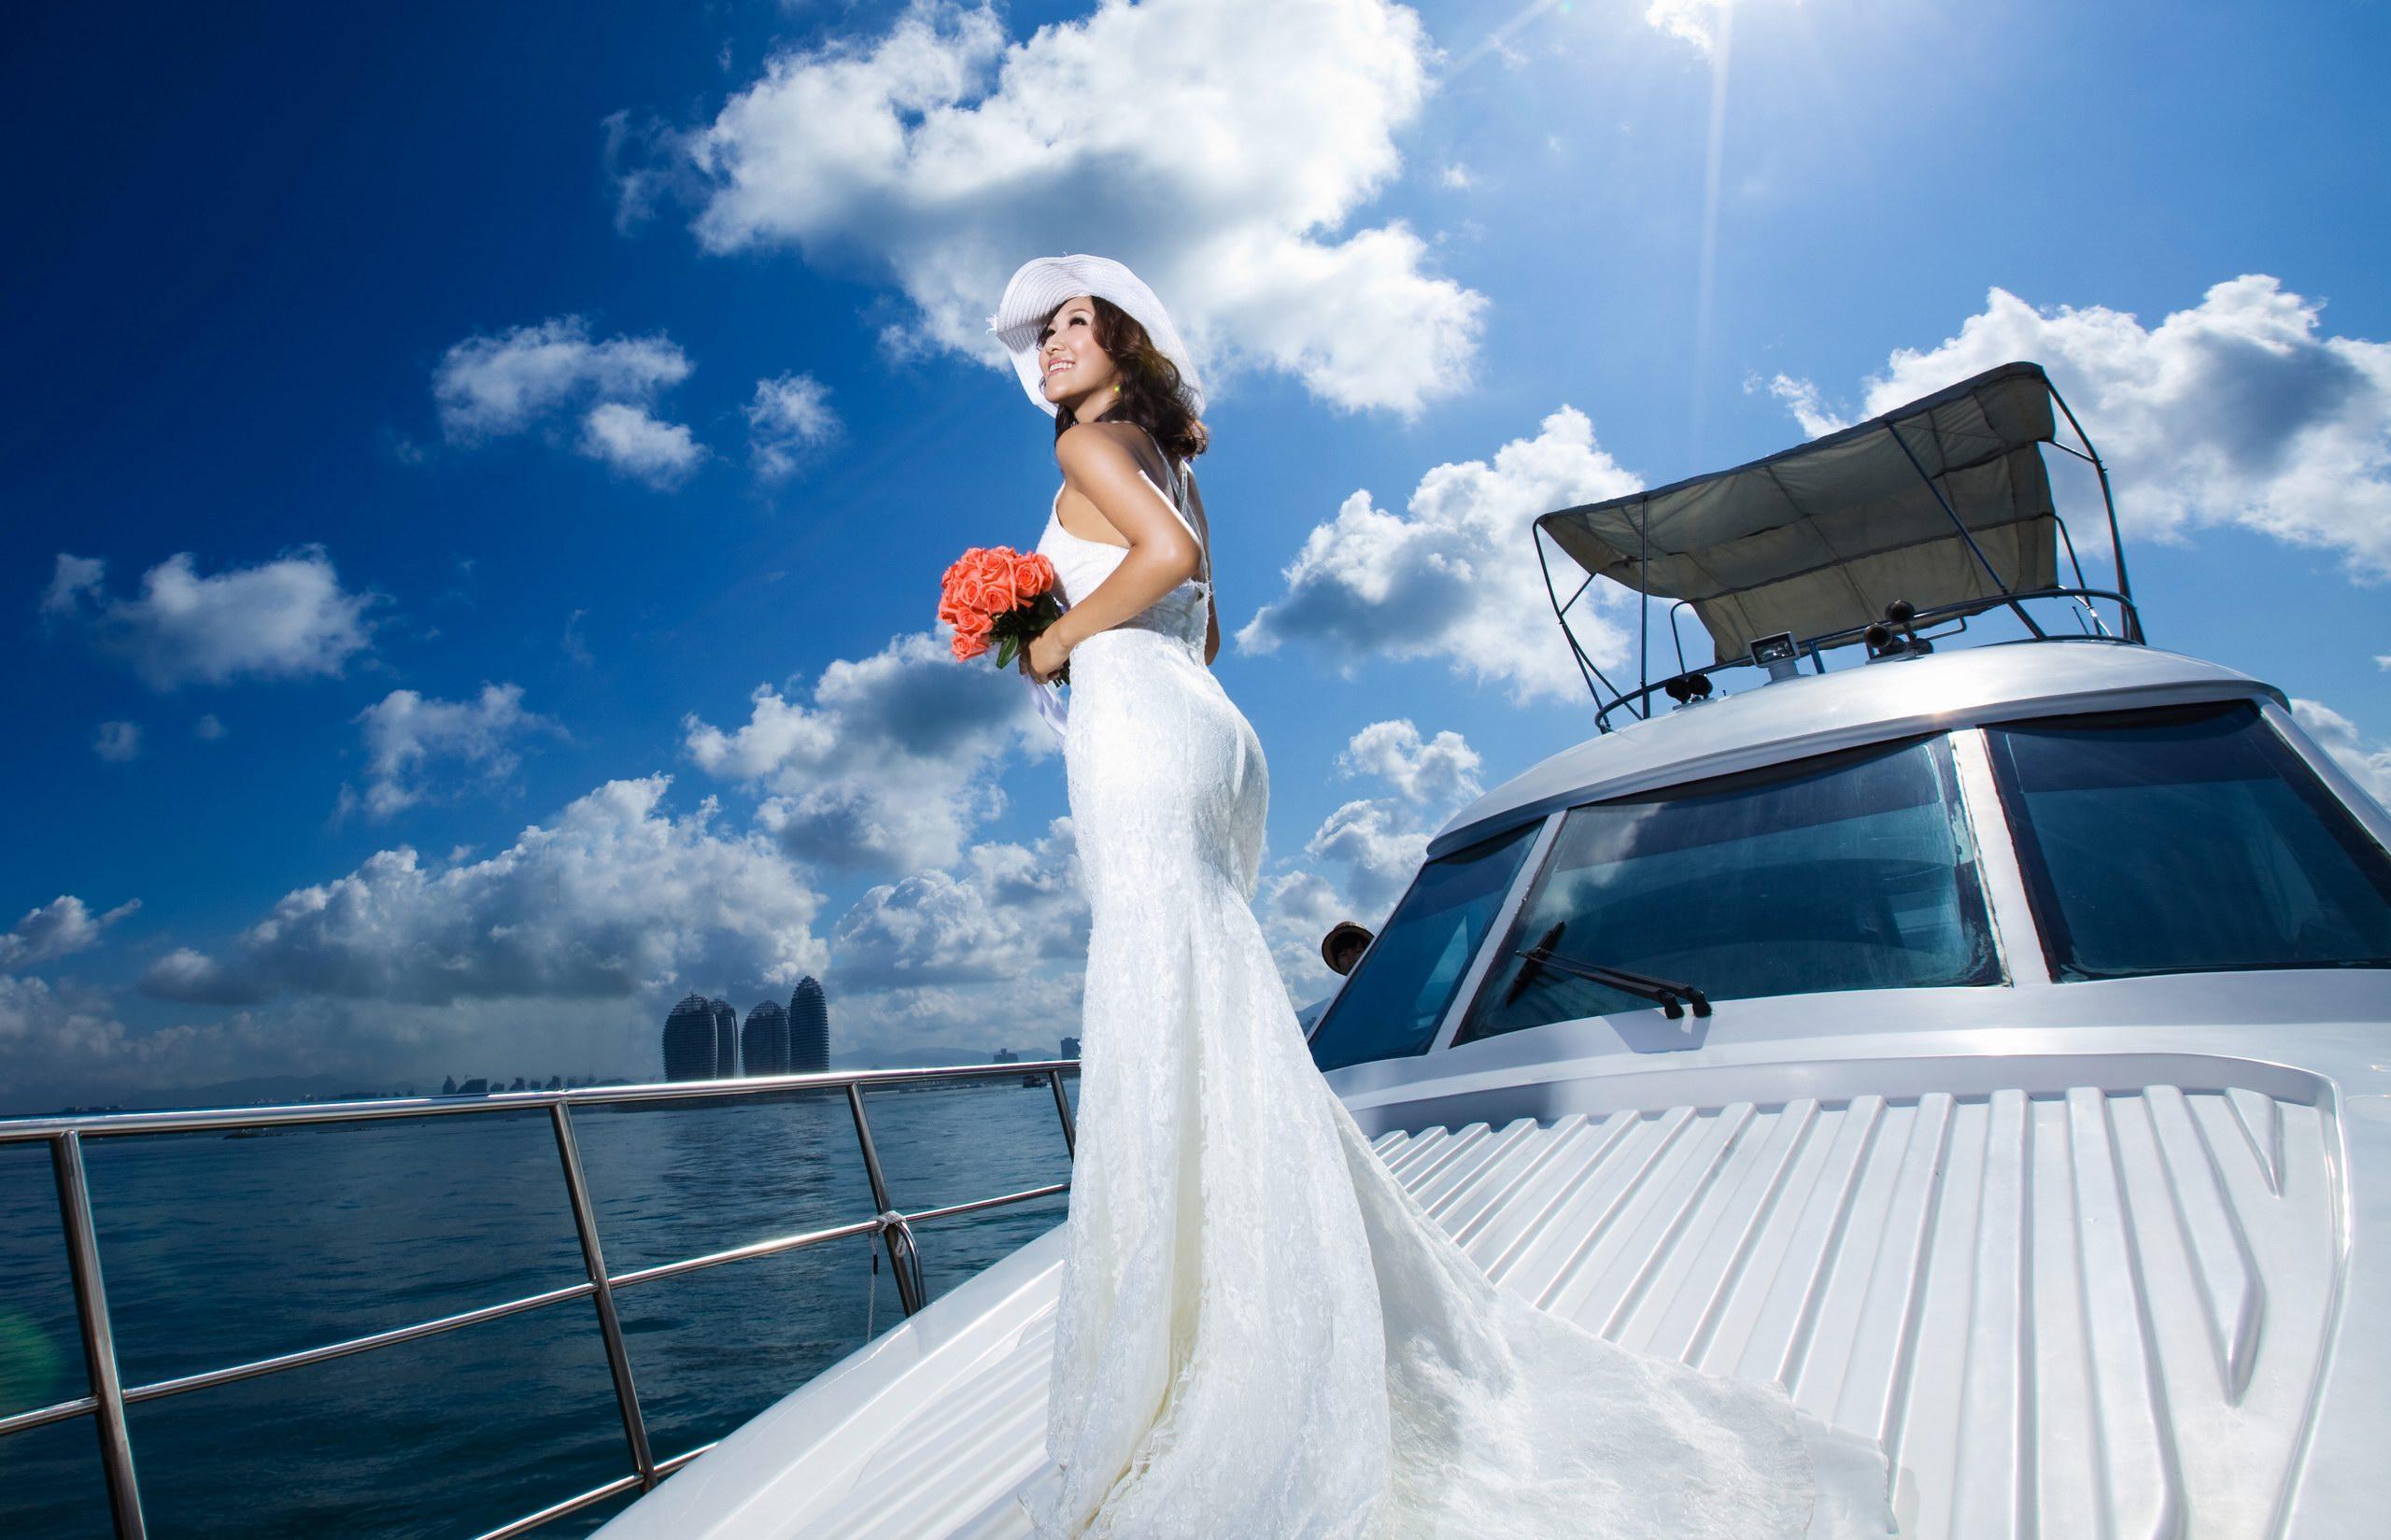 boat lady